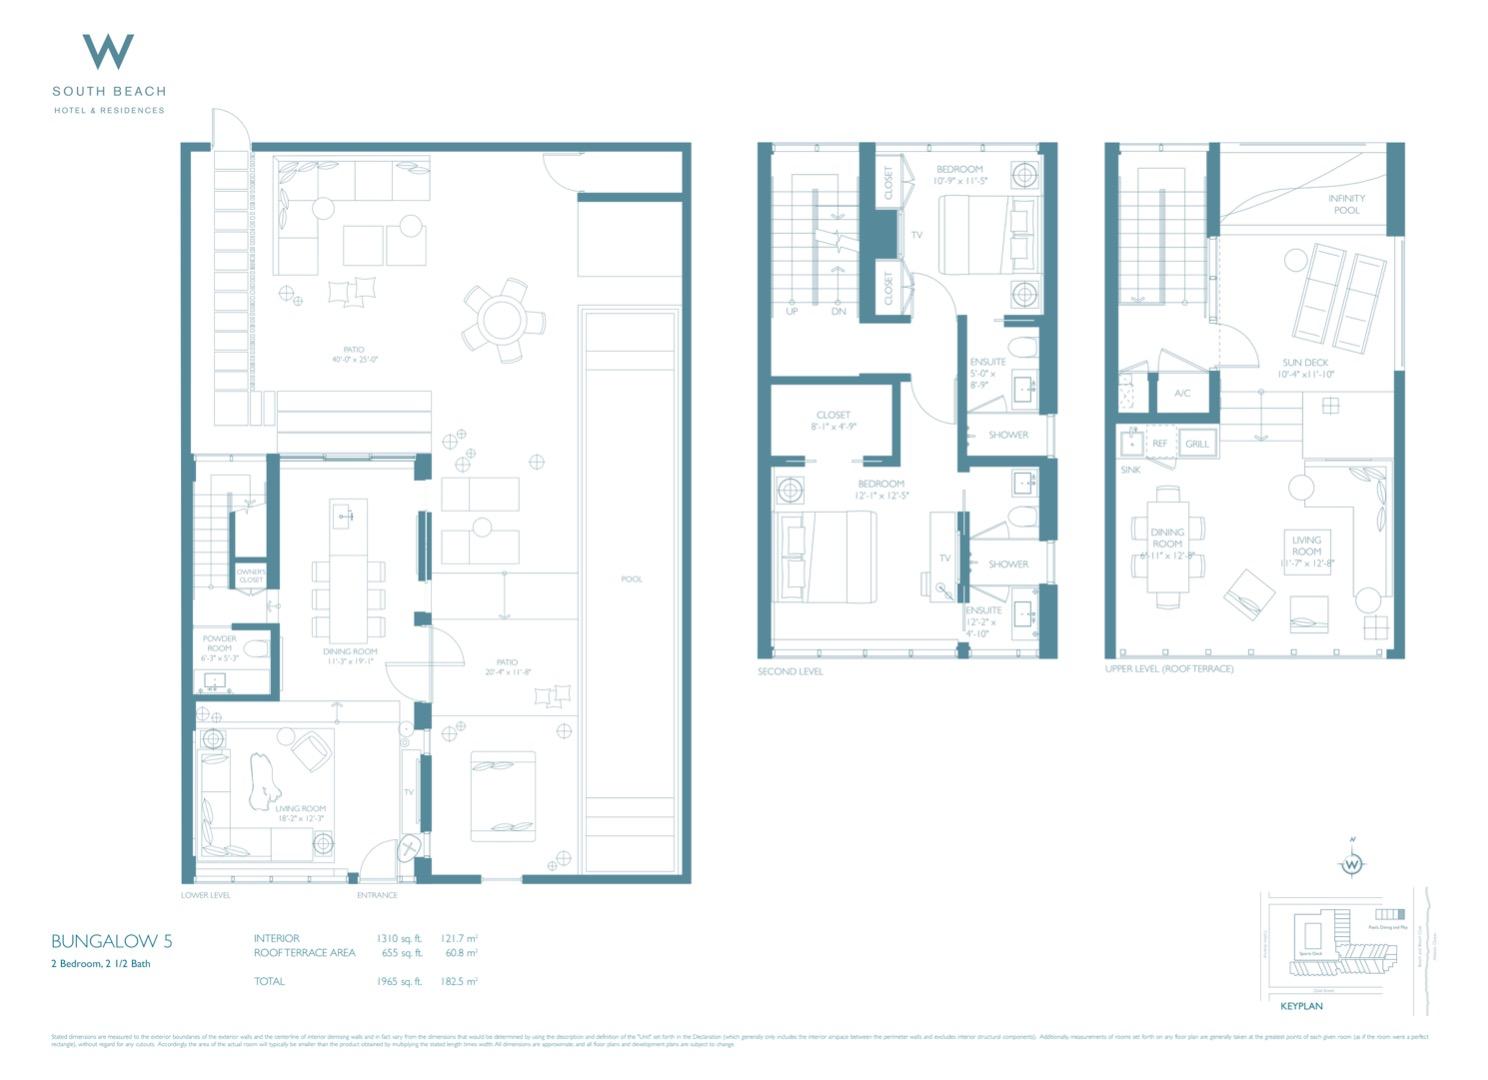 Floor plan image Bungalow 5 - 2/2/1  - 1965 sqft image